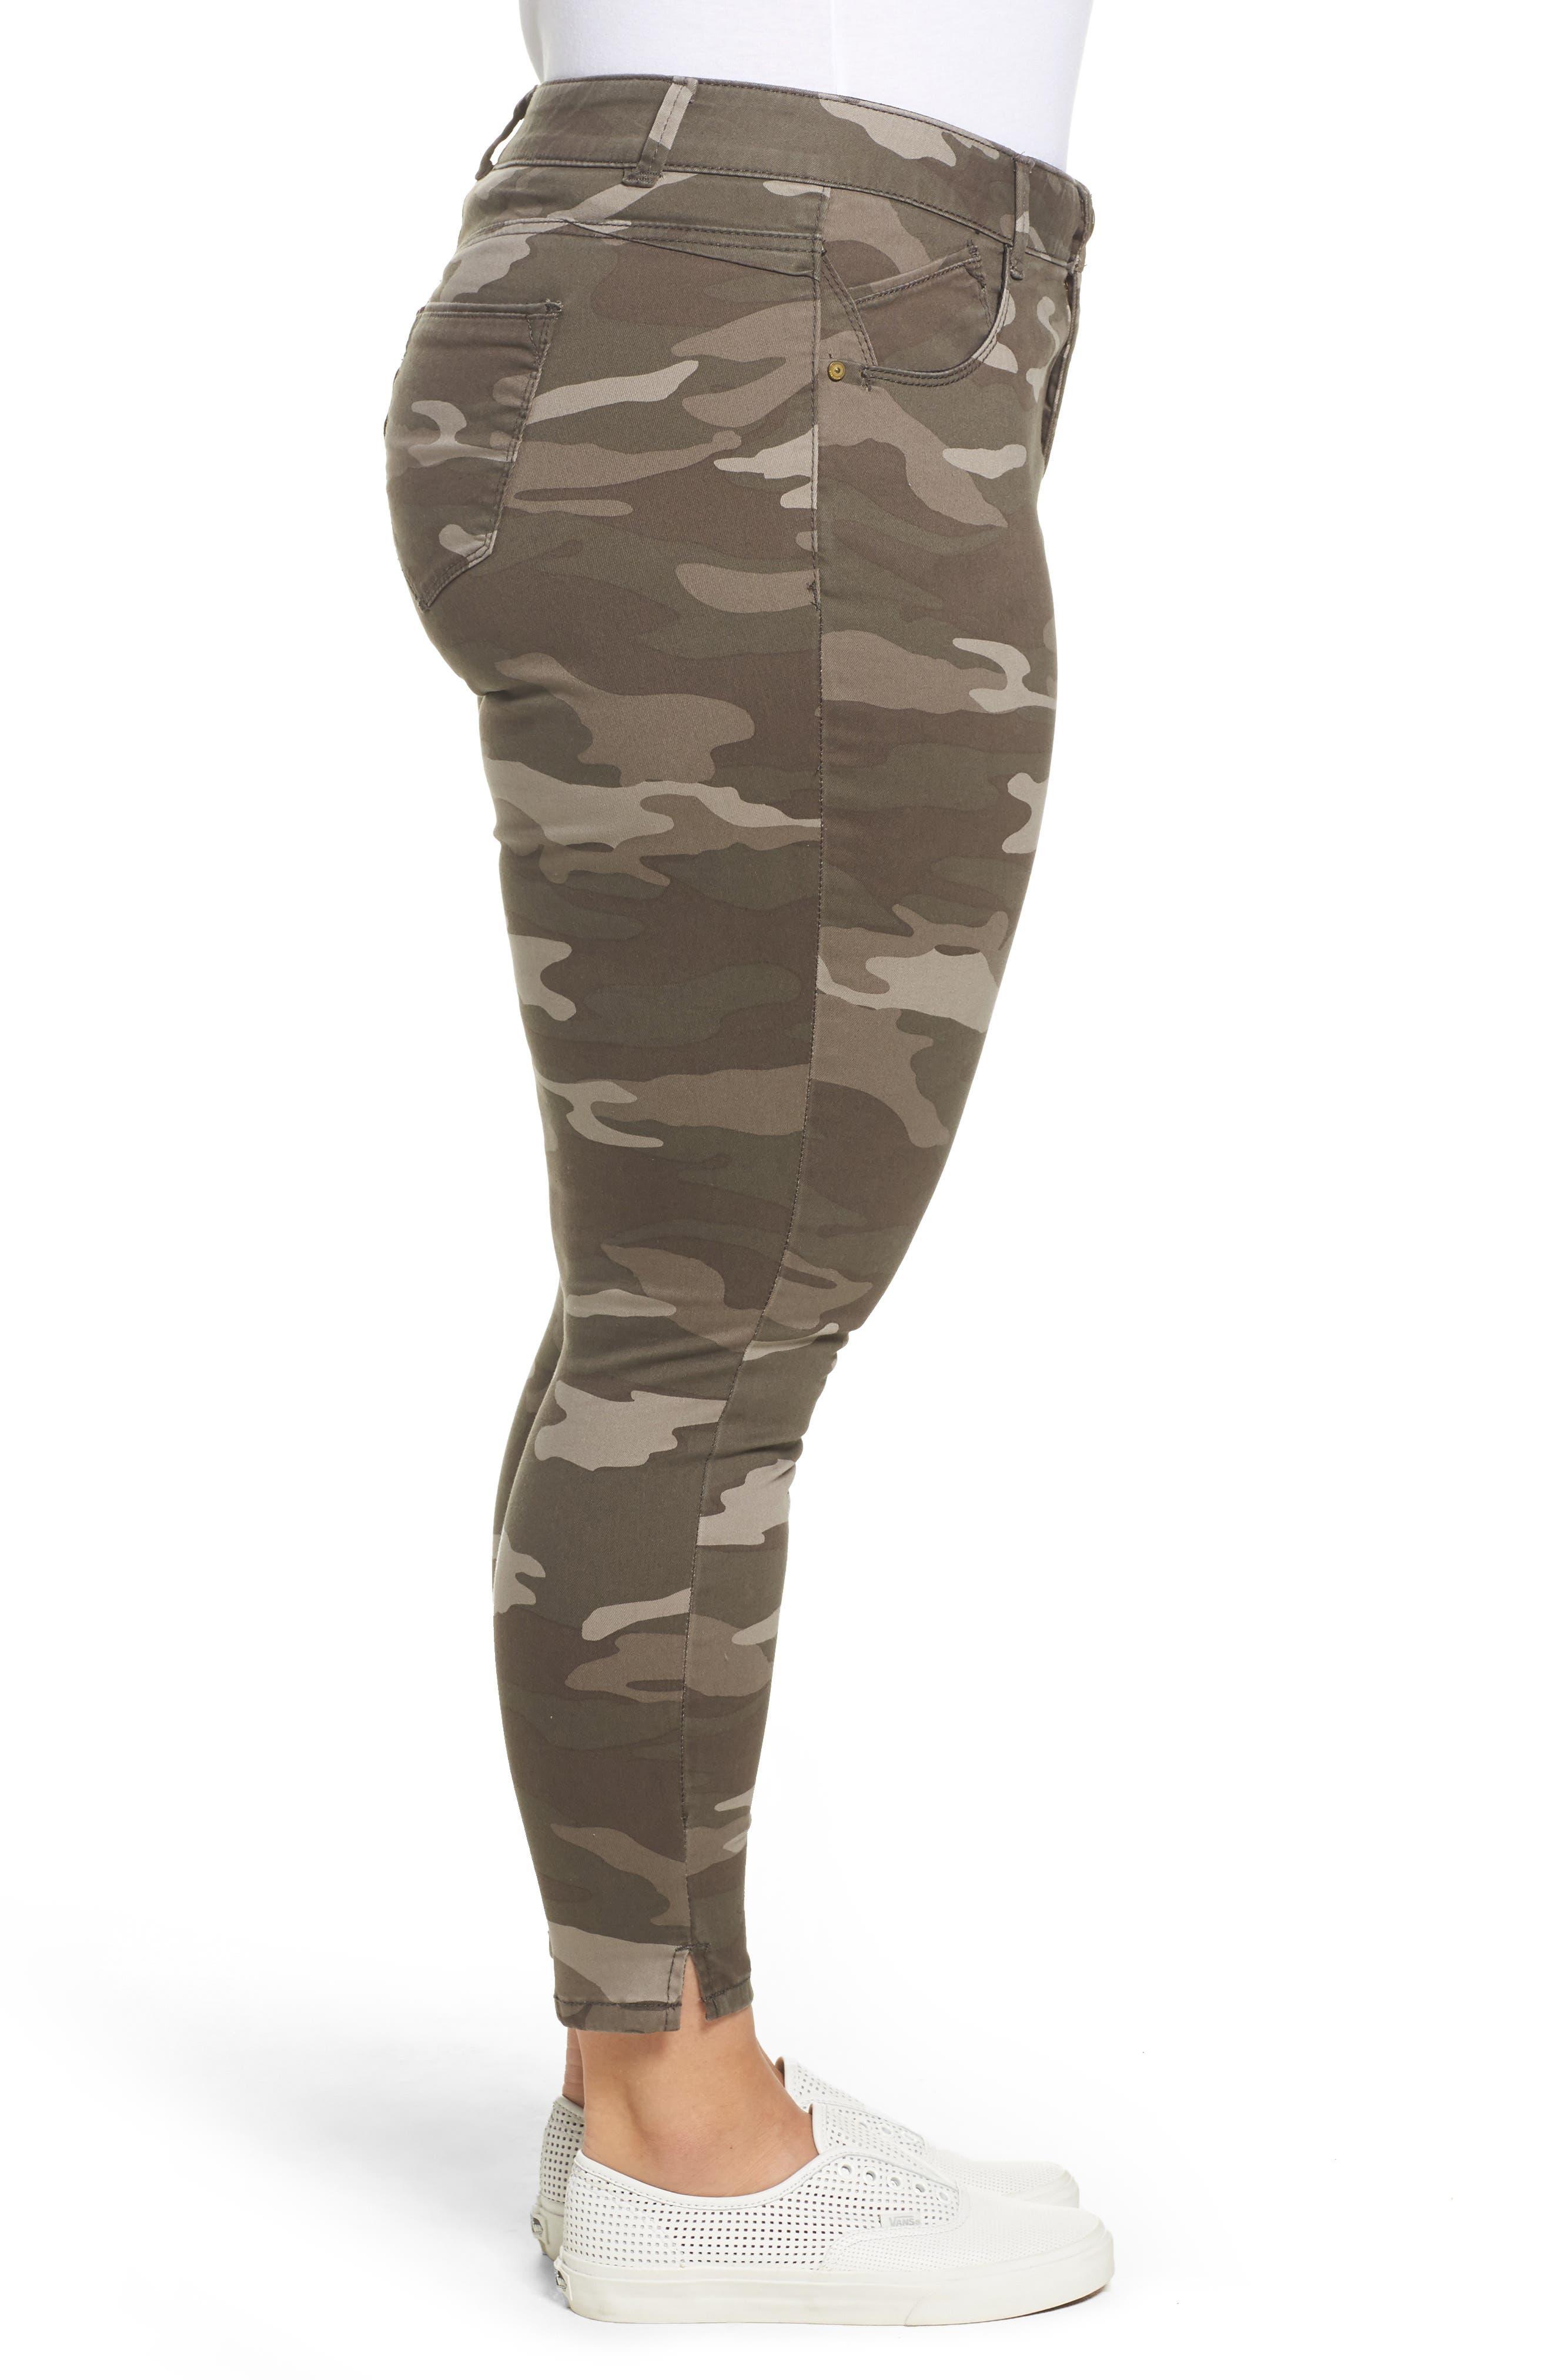 Ab-solution Camo Skinny Pants,                             Alternate thumbnail 3, color,                             250